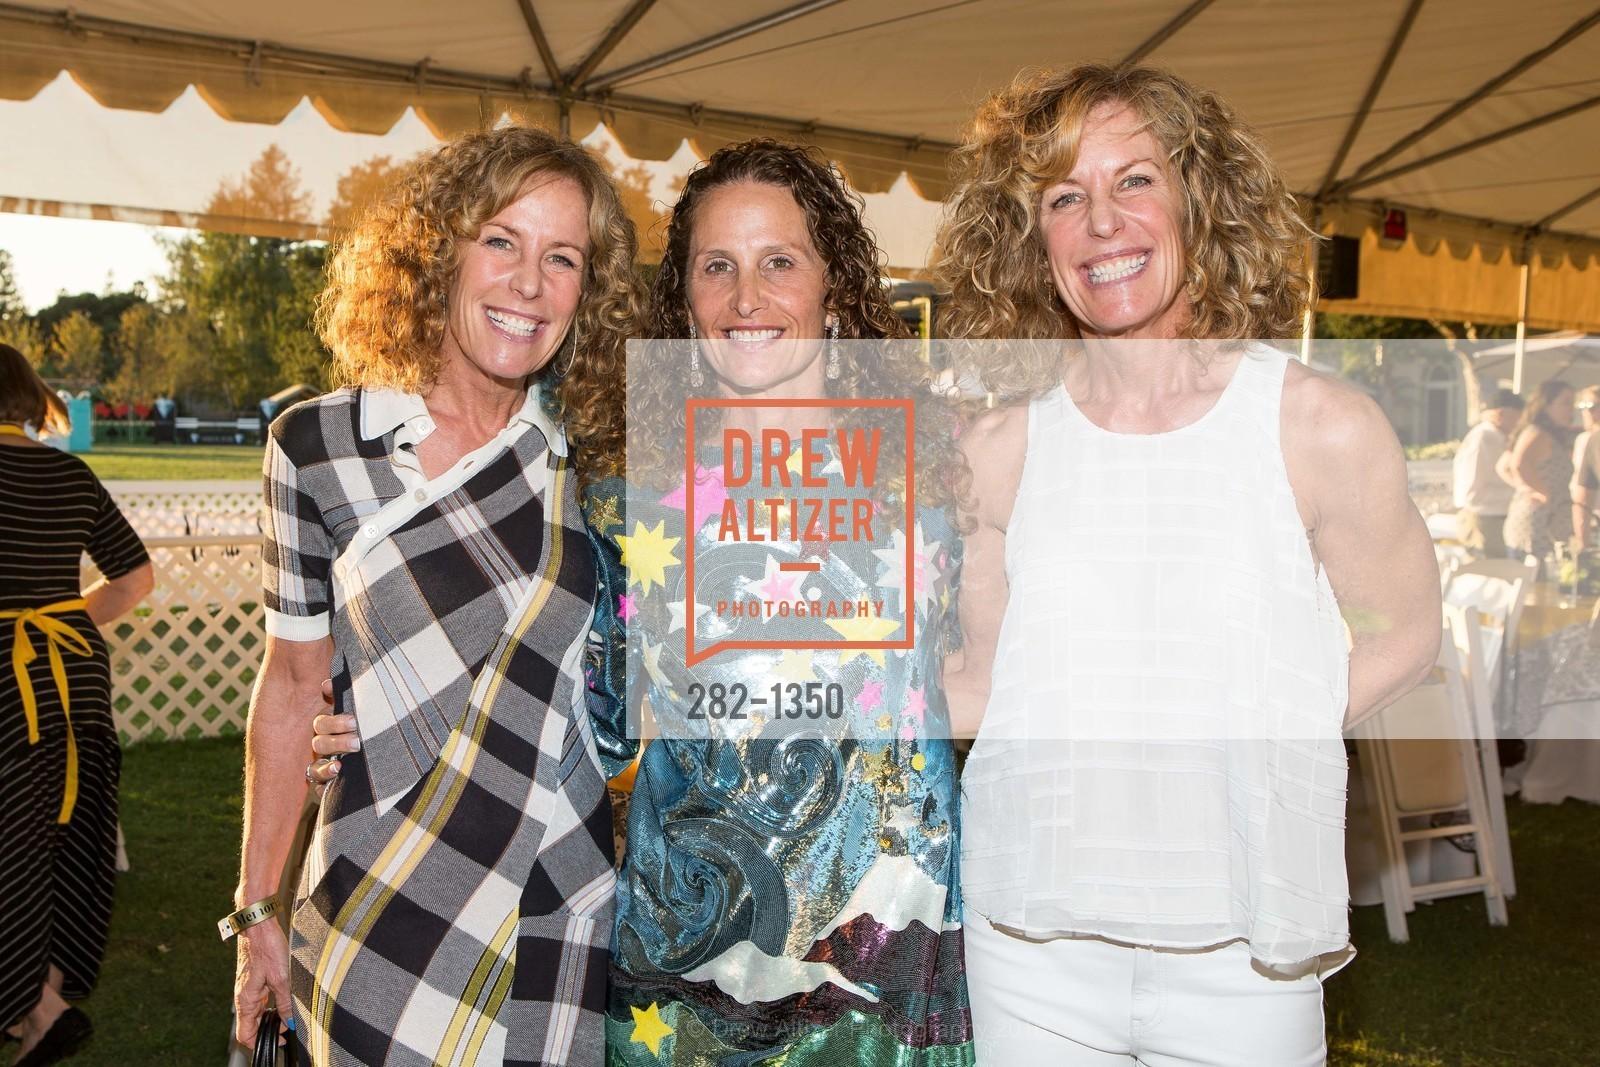 Lori Corley, Stacey Siebel, Lisa Steiny, Photo #282-1350